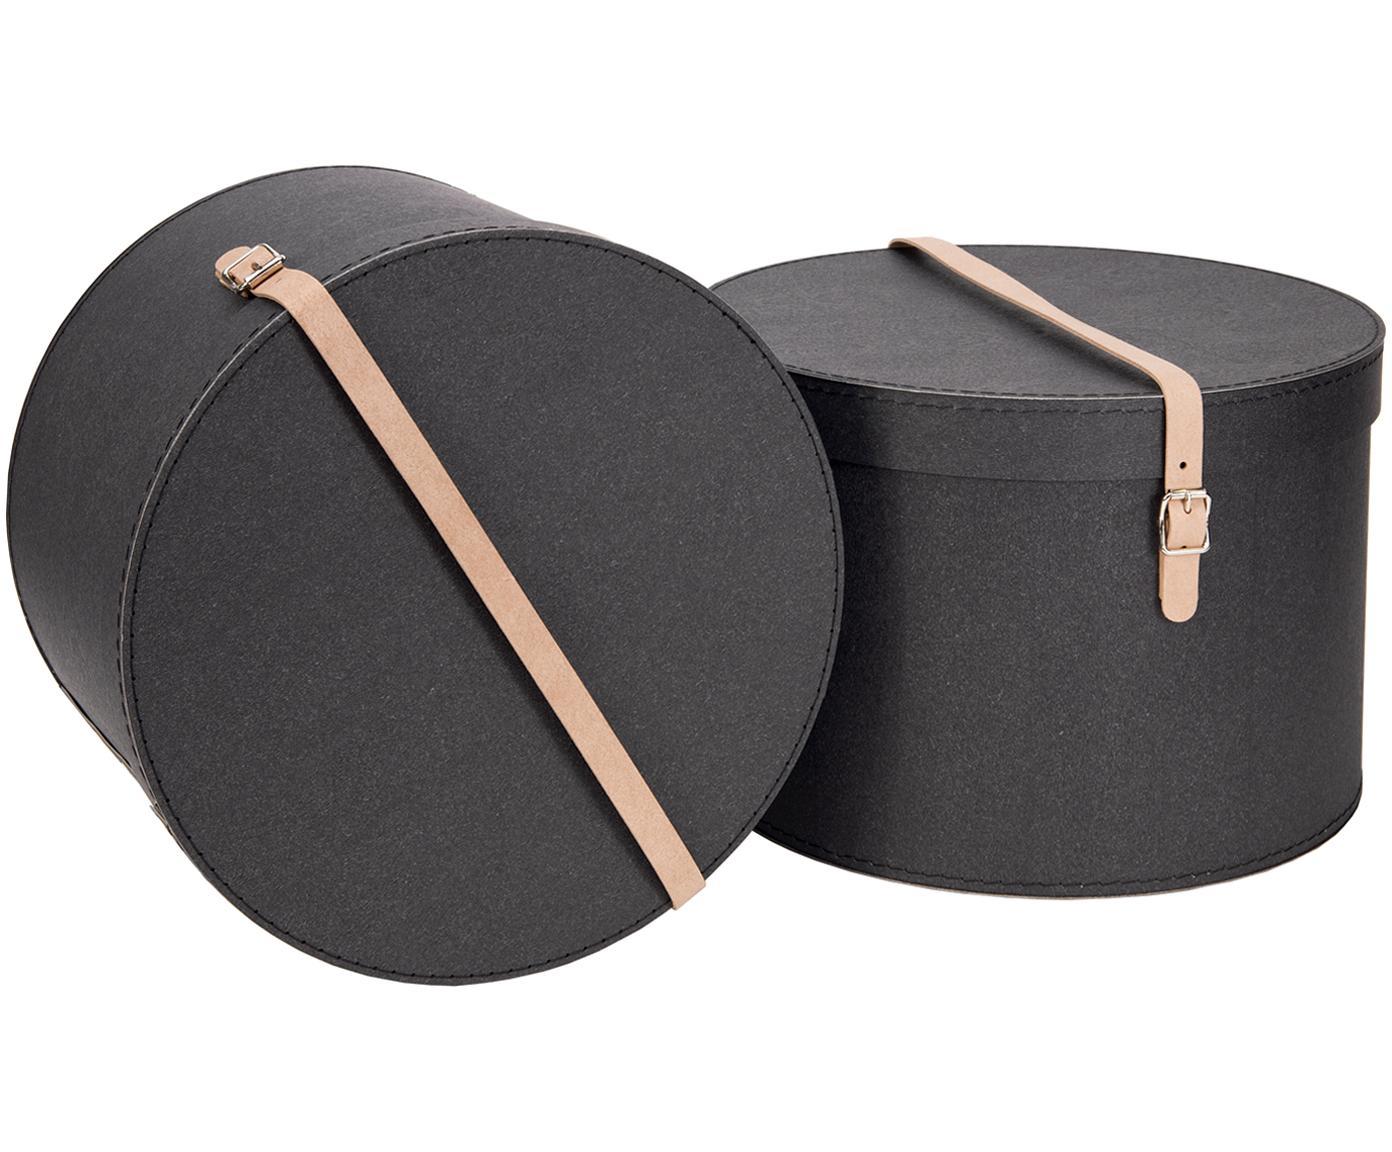 Set de cajas Rut, 2pzas., Caja: cartón sólido, con estamp, Asa: cuero, metal, Exterior: negro Interior: negro Asa: beige, Tamaños diferentes